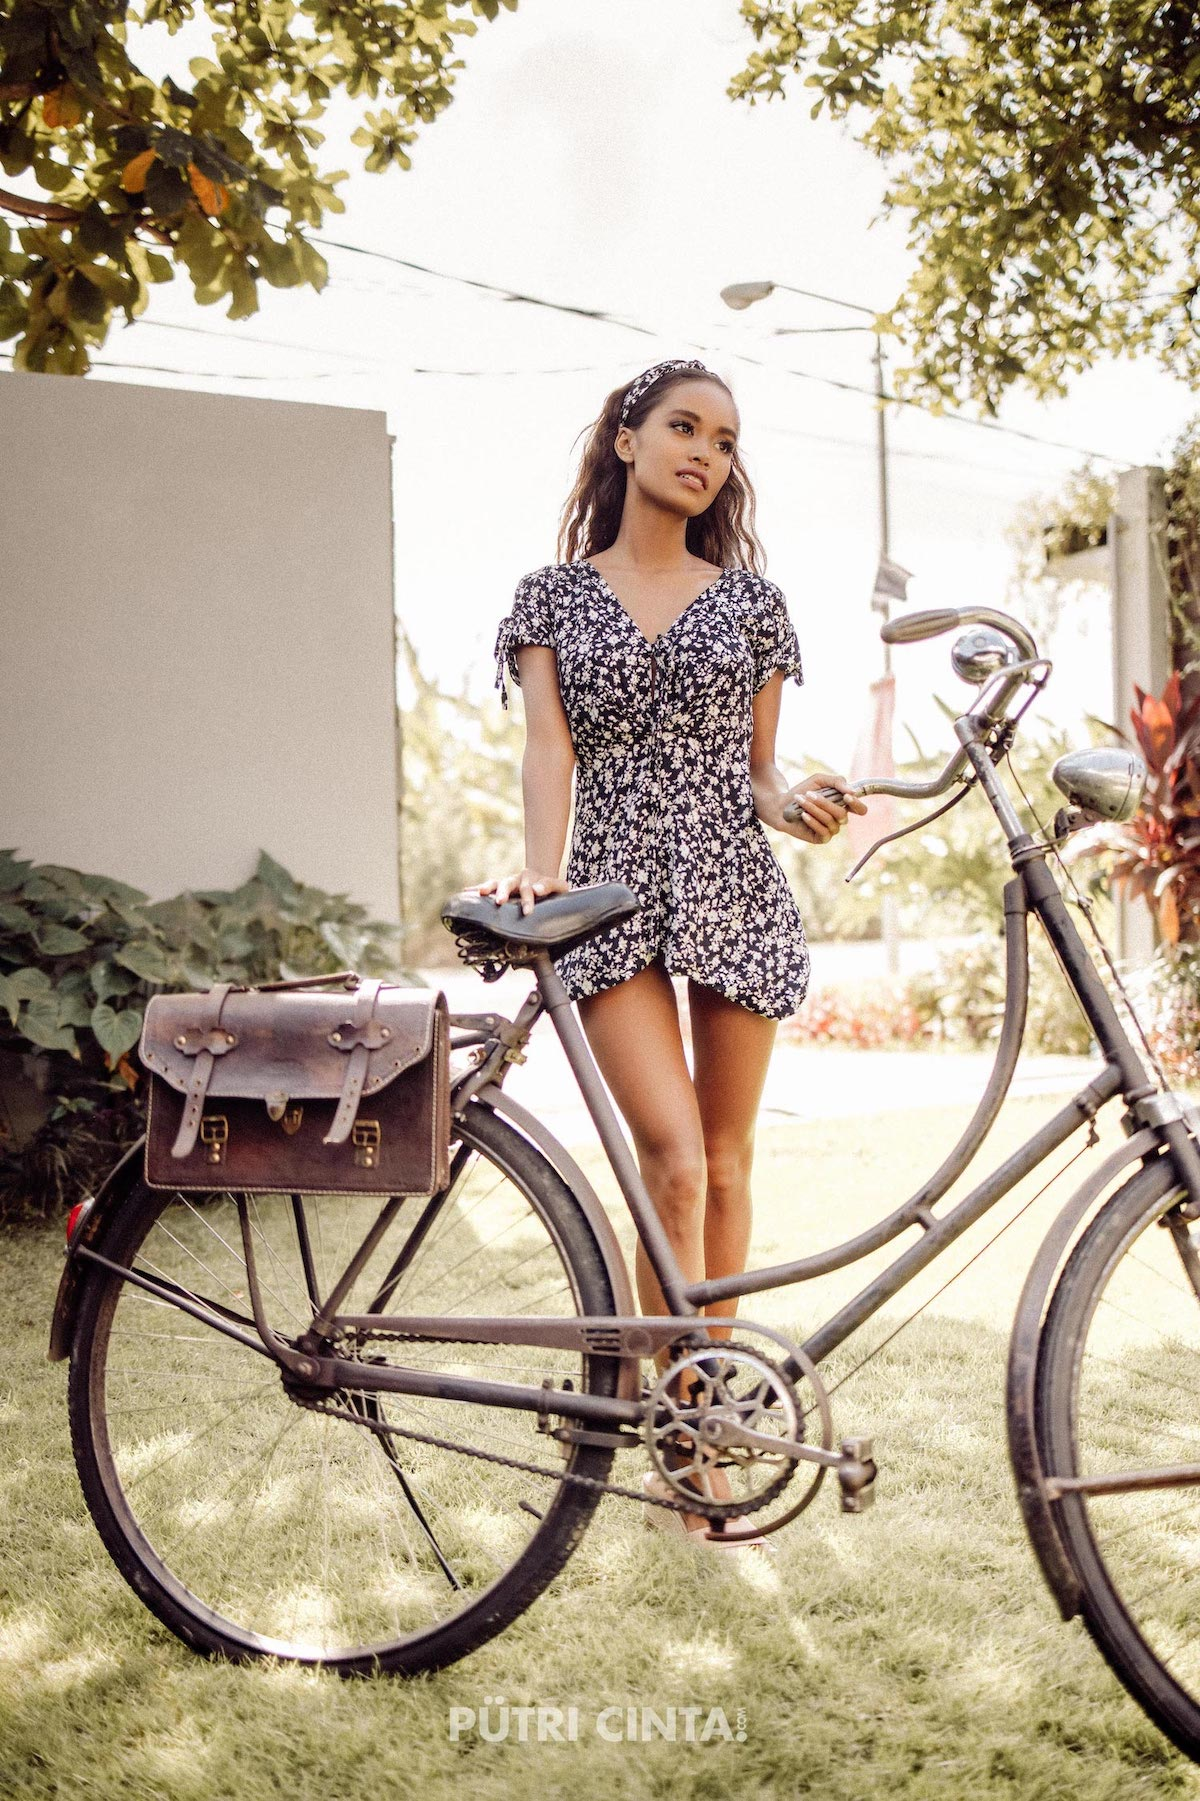 024-Putri-Cinta-Cycling-Commando-photoset-18.jpg